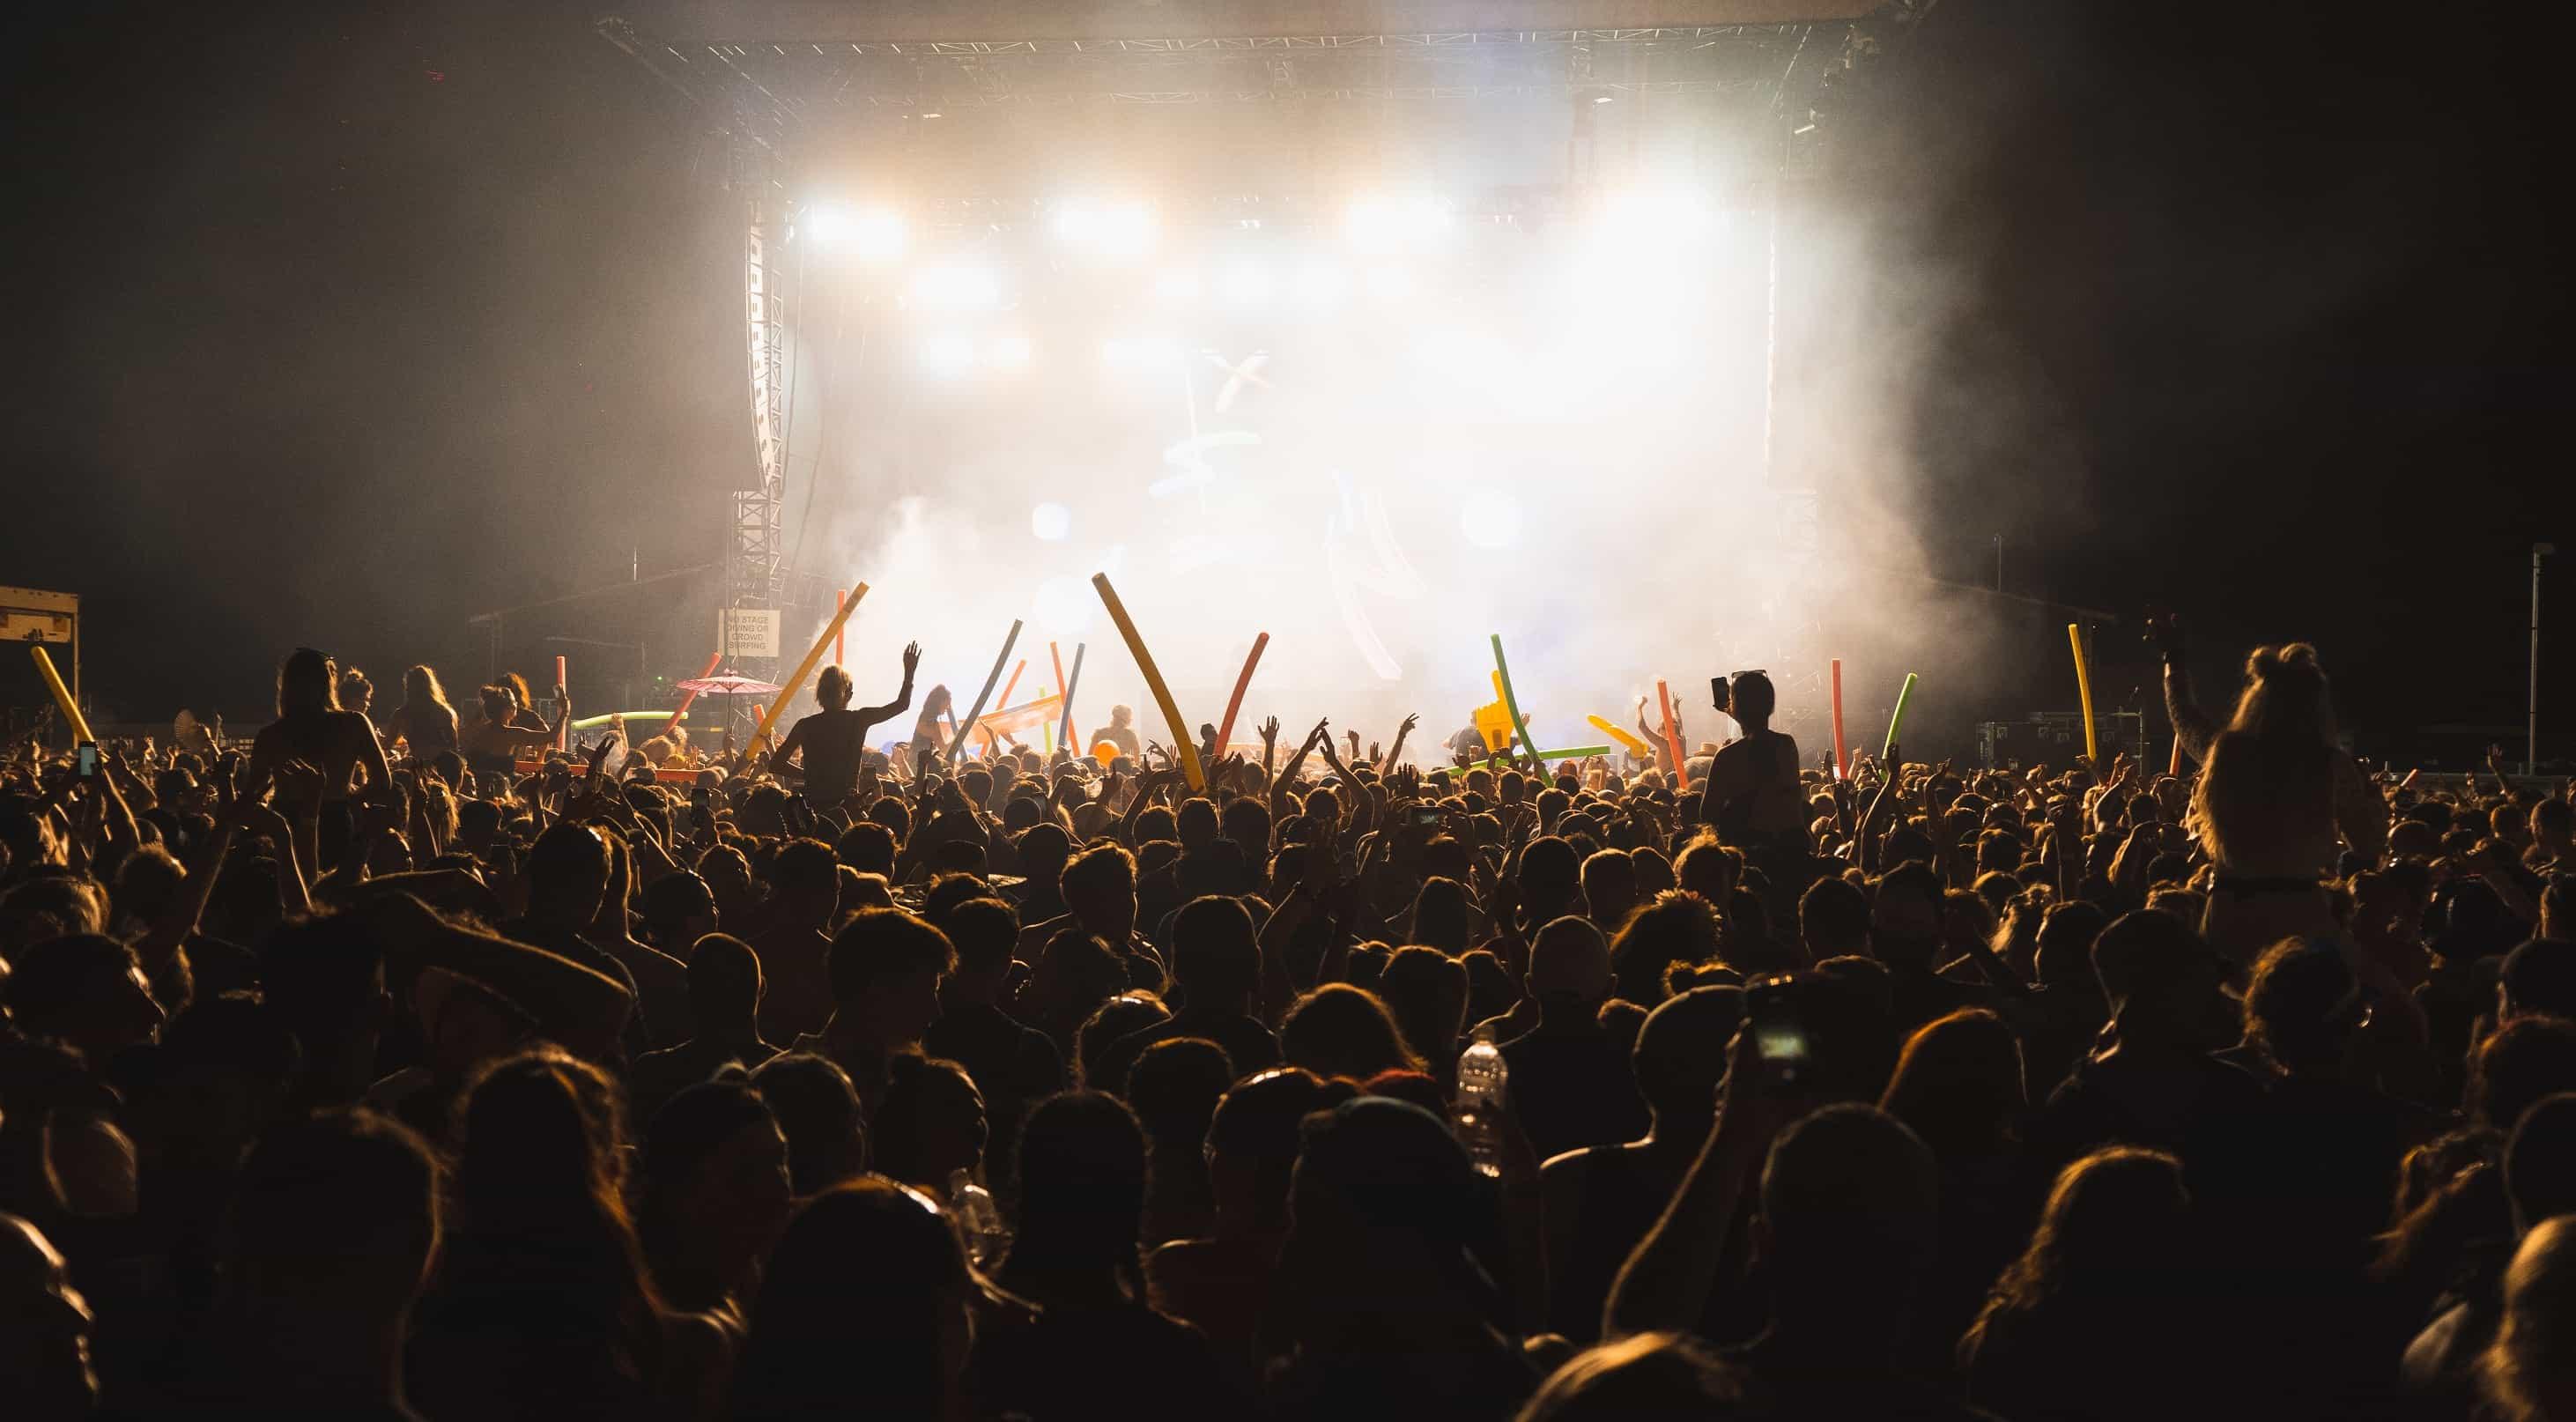 Festival Event Concert Electronic Music Festivals Music Festival